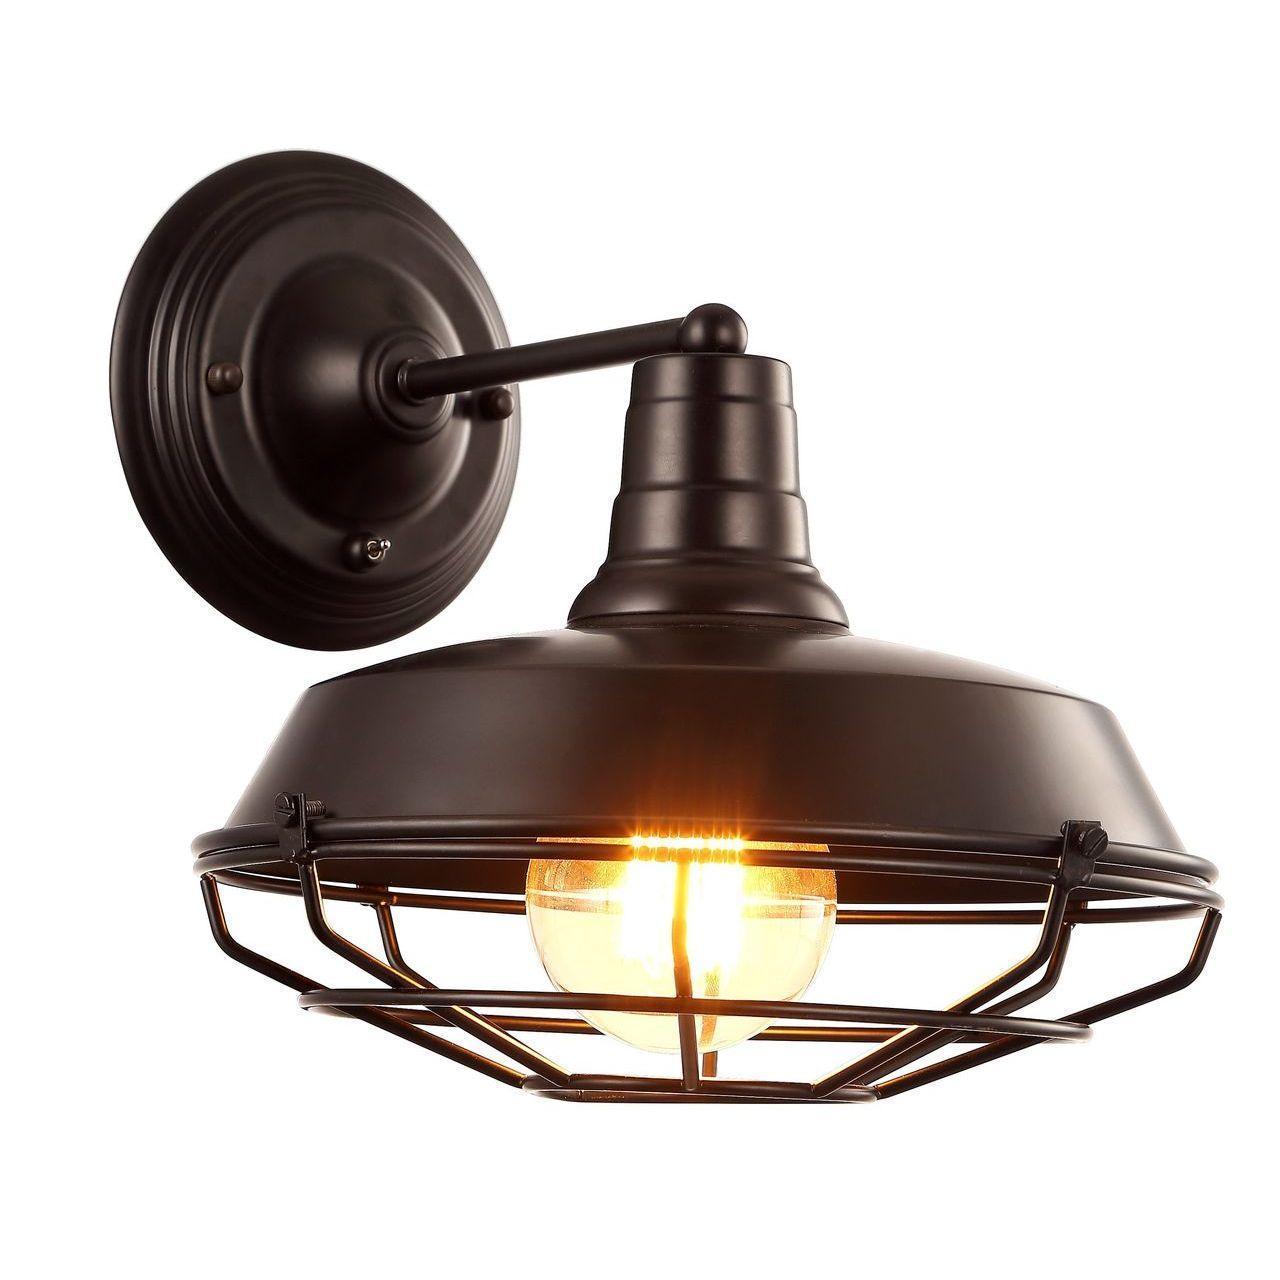 Бра Arte Lamp Ferrico A9183AP-1BK бра arte lamp ferrico a9183ap 1wg